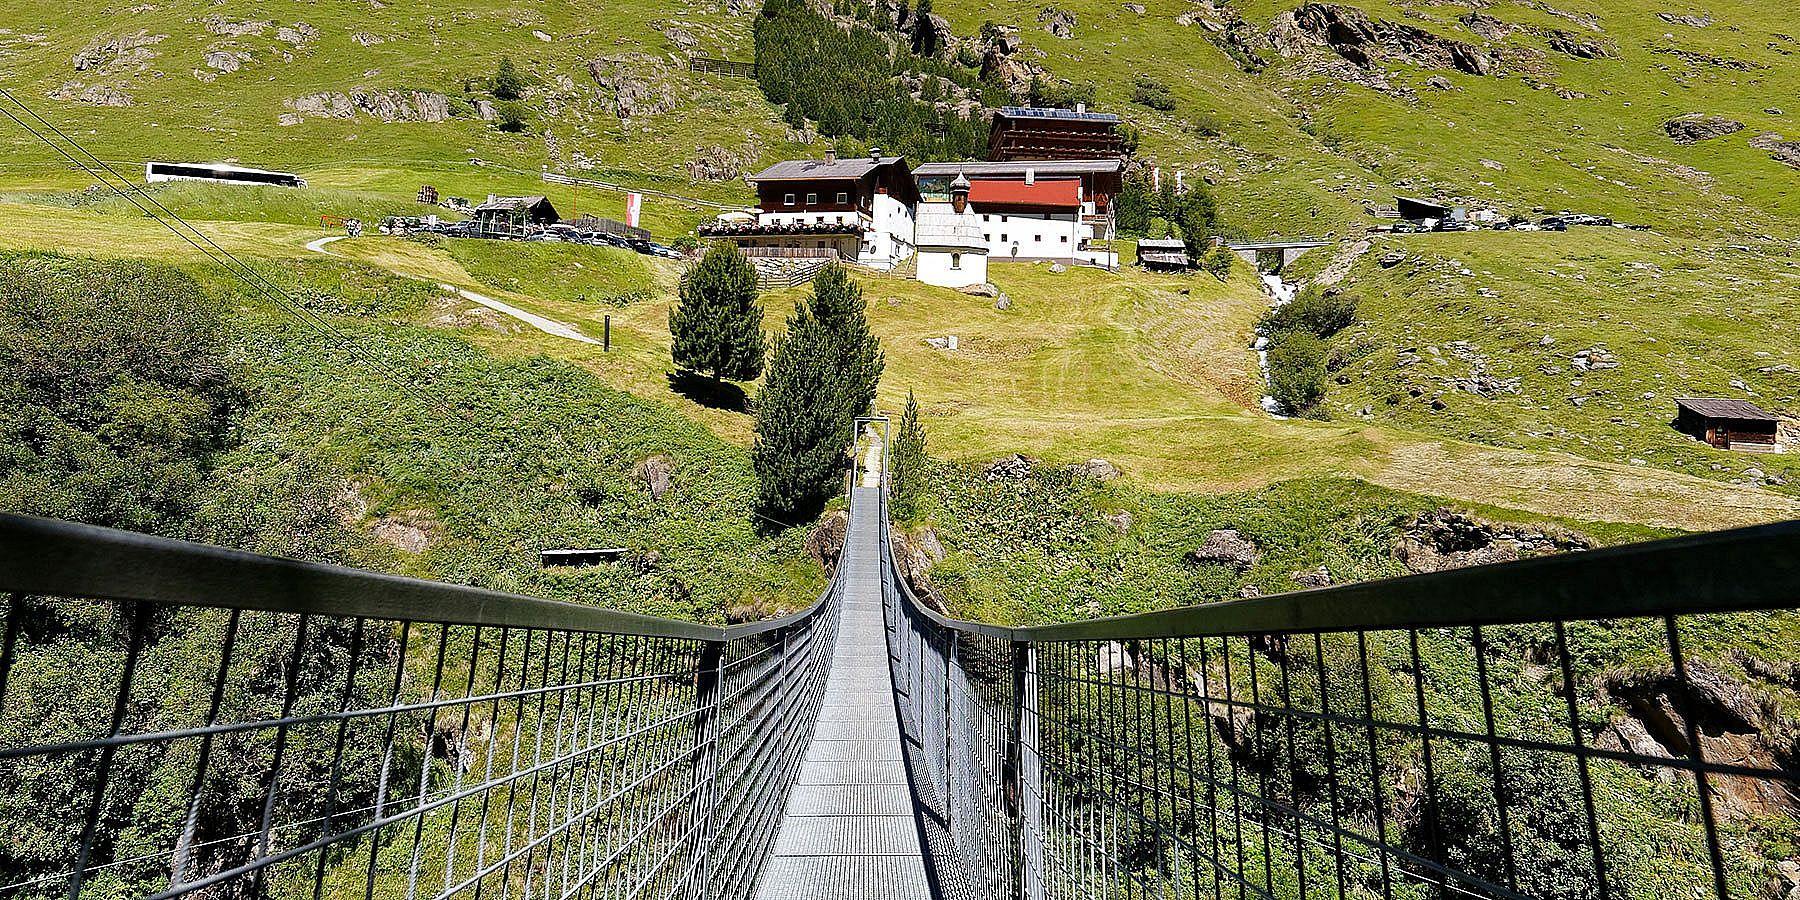 Hängebrücke Rofenhöfe in Vent